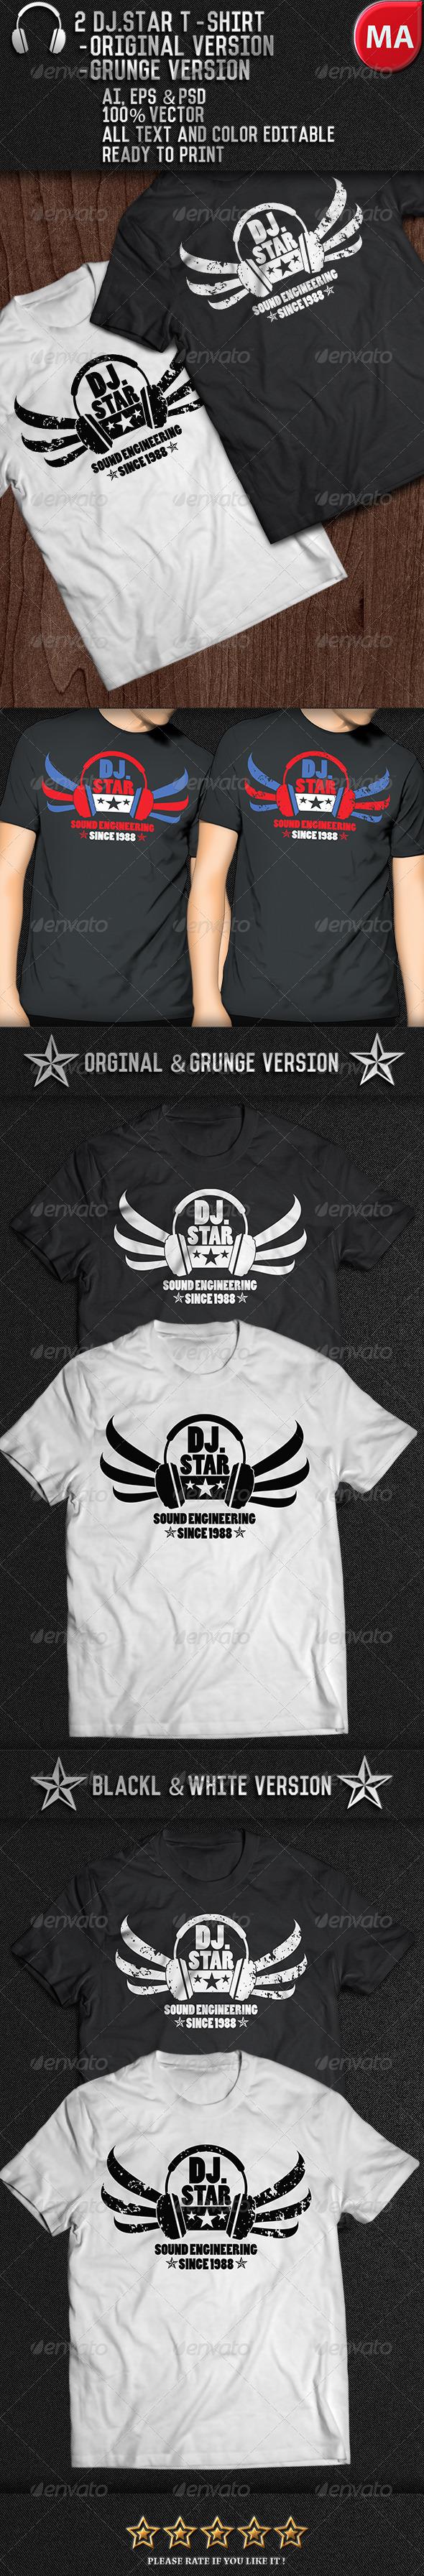 GraphicRiver DJ Music T-Shirt 7724411